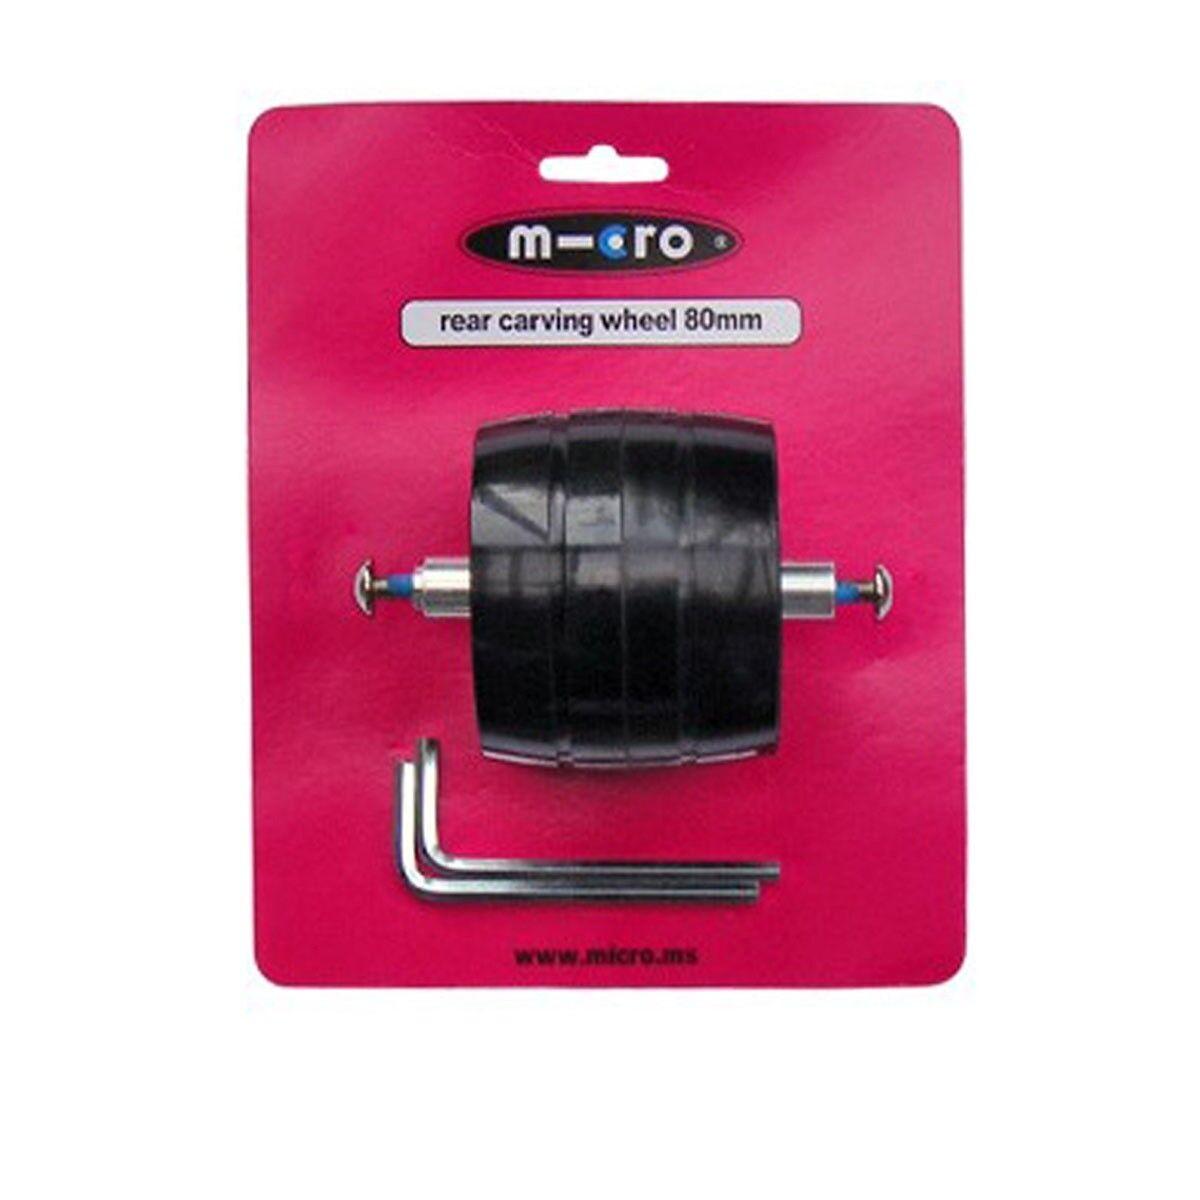 Micro Rolle Carving Carving Carving 80mm komplett  | Starke Hitze- und Hitzebeständigkeit  c5a917